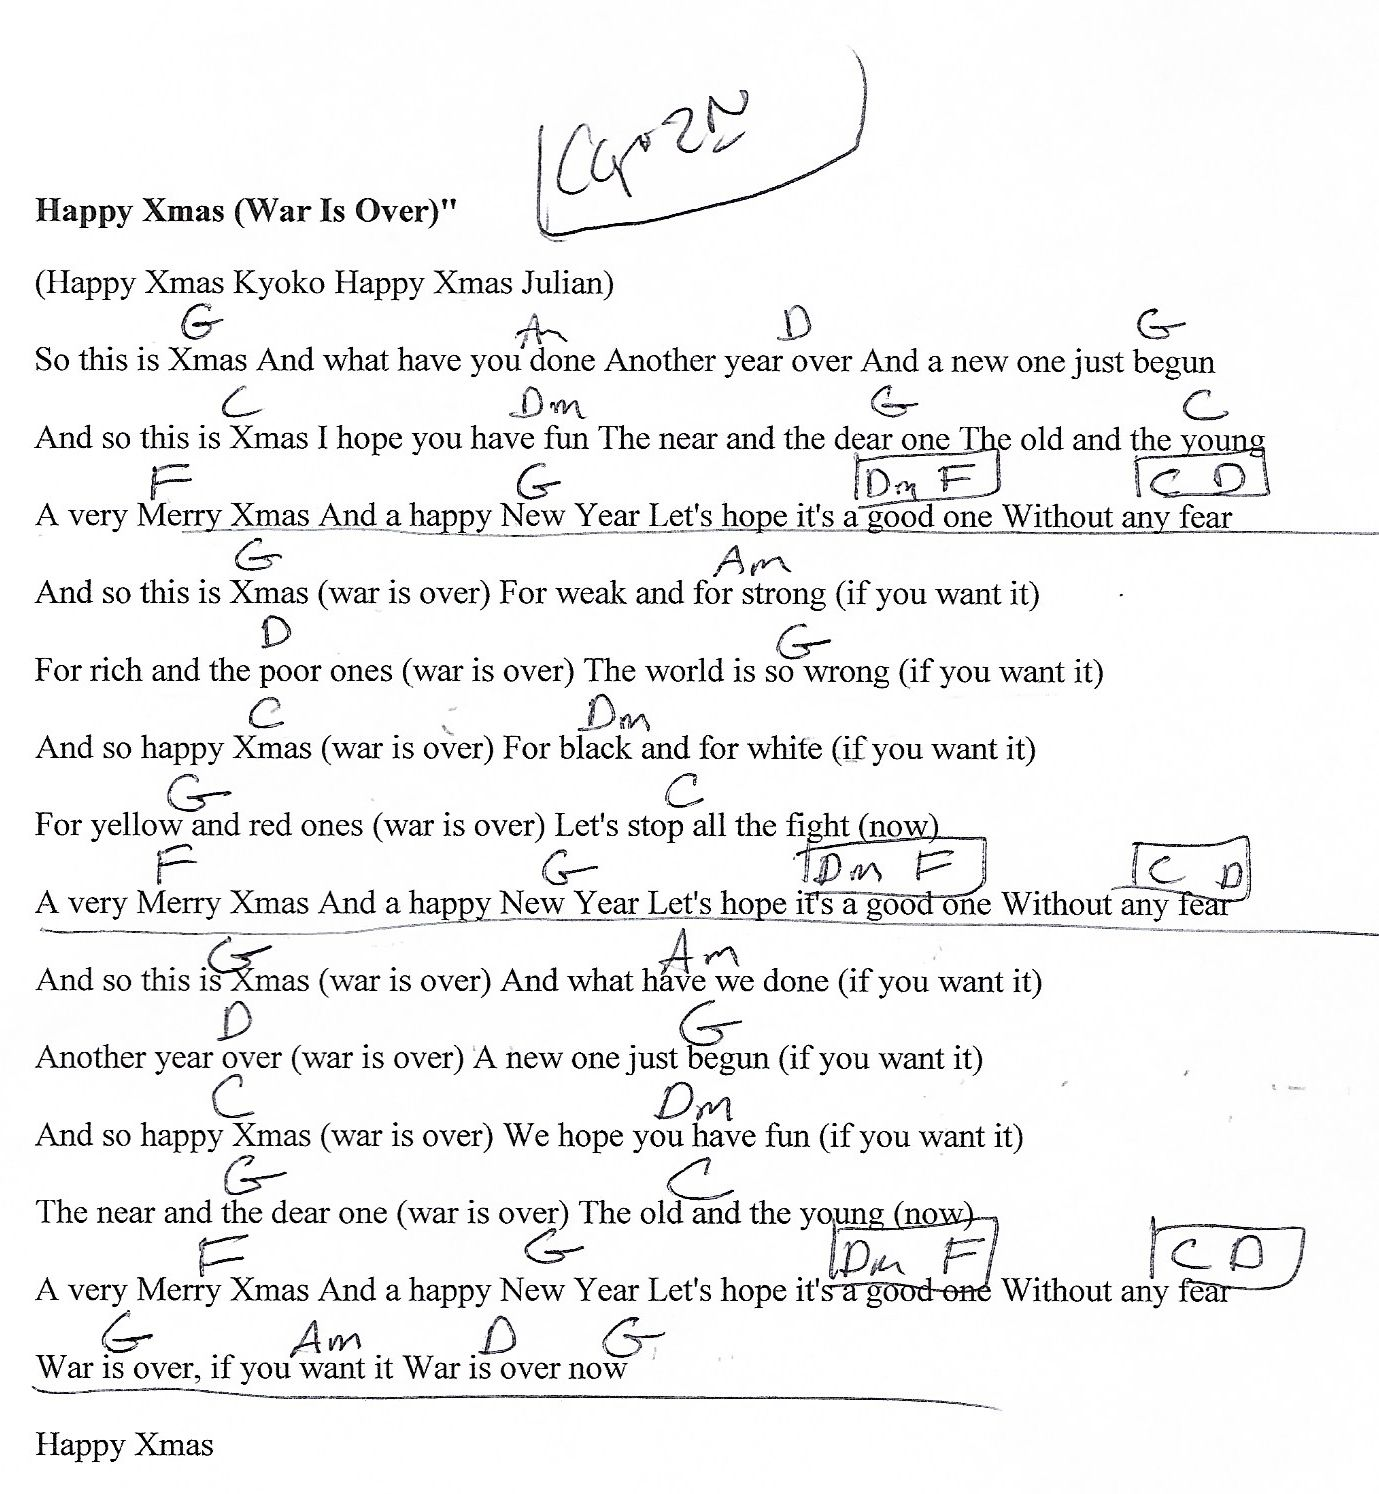 Happy x mas john lennon capo 2nd guitar chord chart http happy x mas john lennon capo 2nd guitar chord chart http hexwebz Images